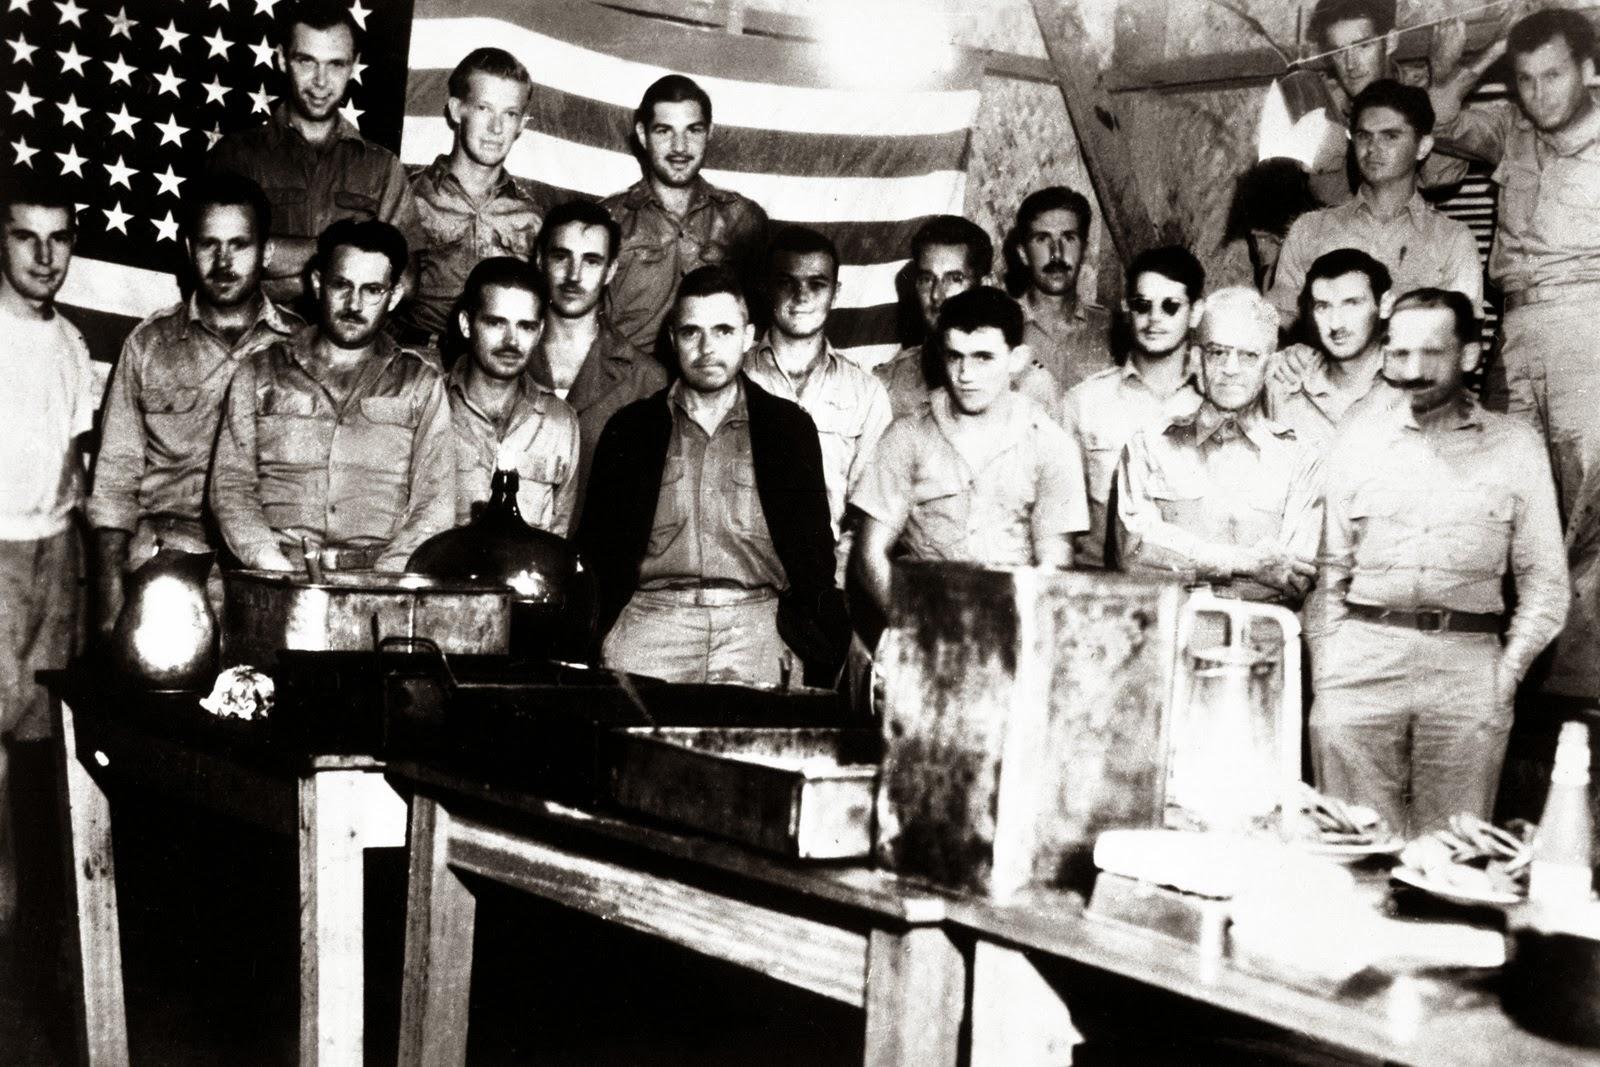 World War II Pictures In Details: American Prisoners of ...